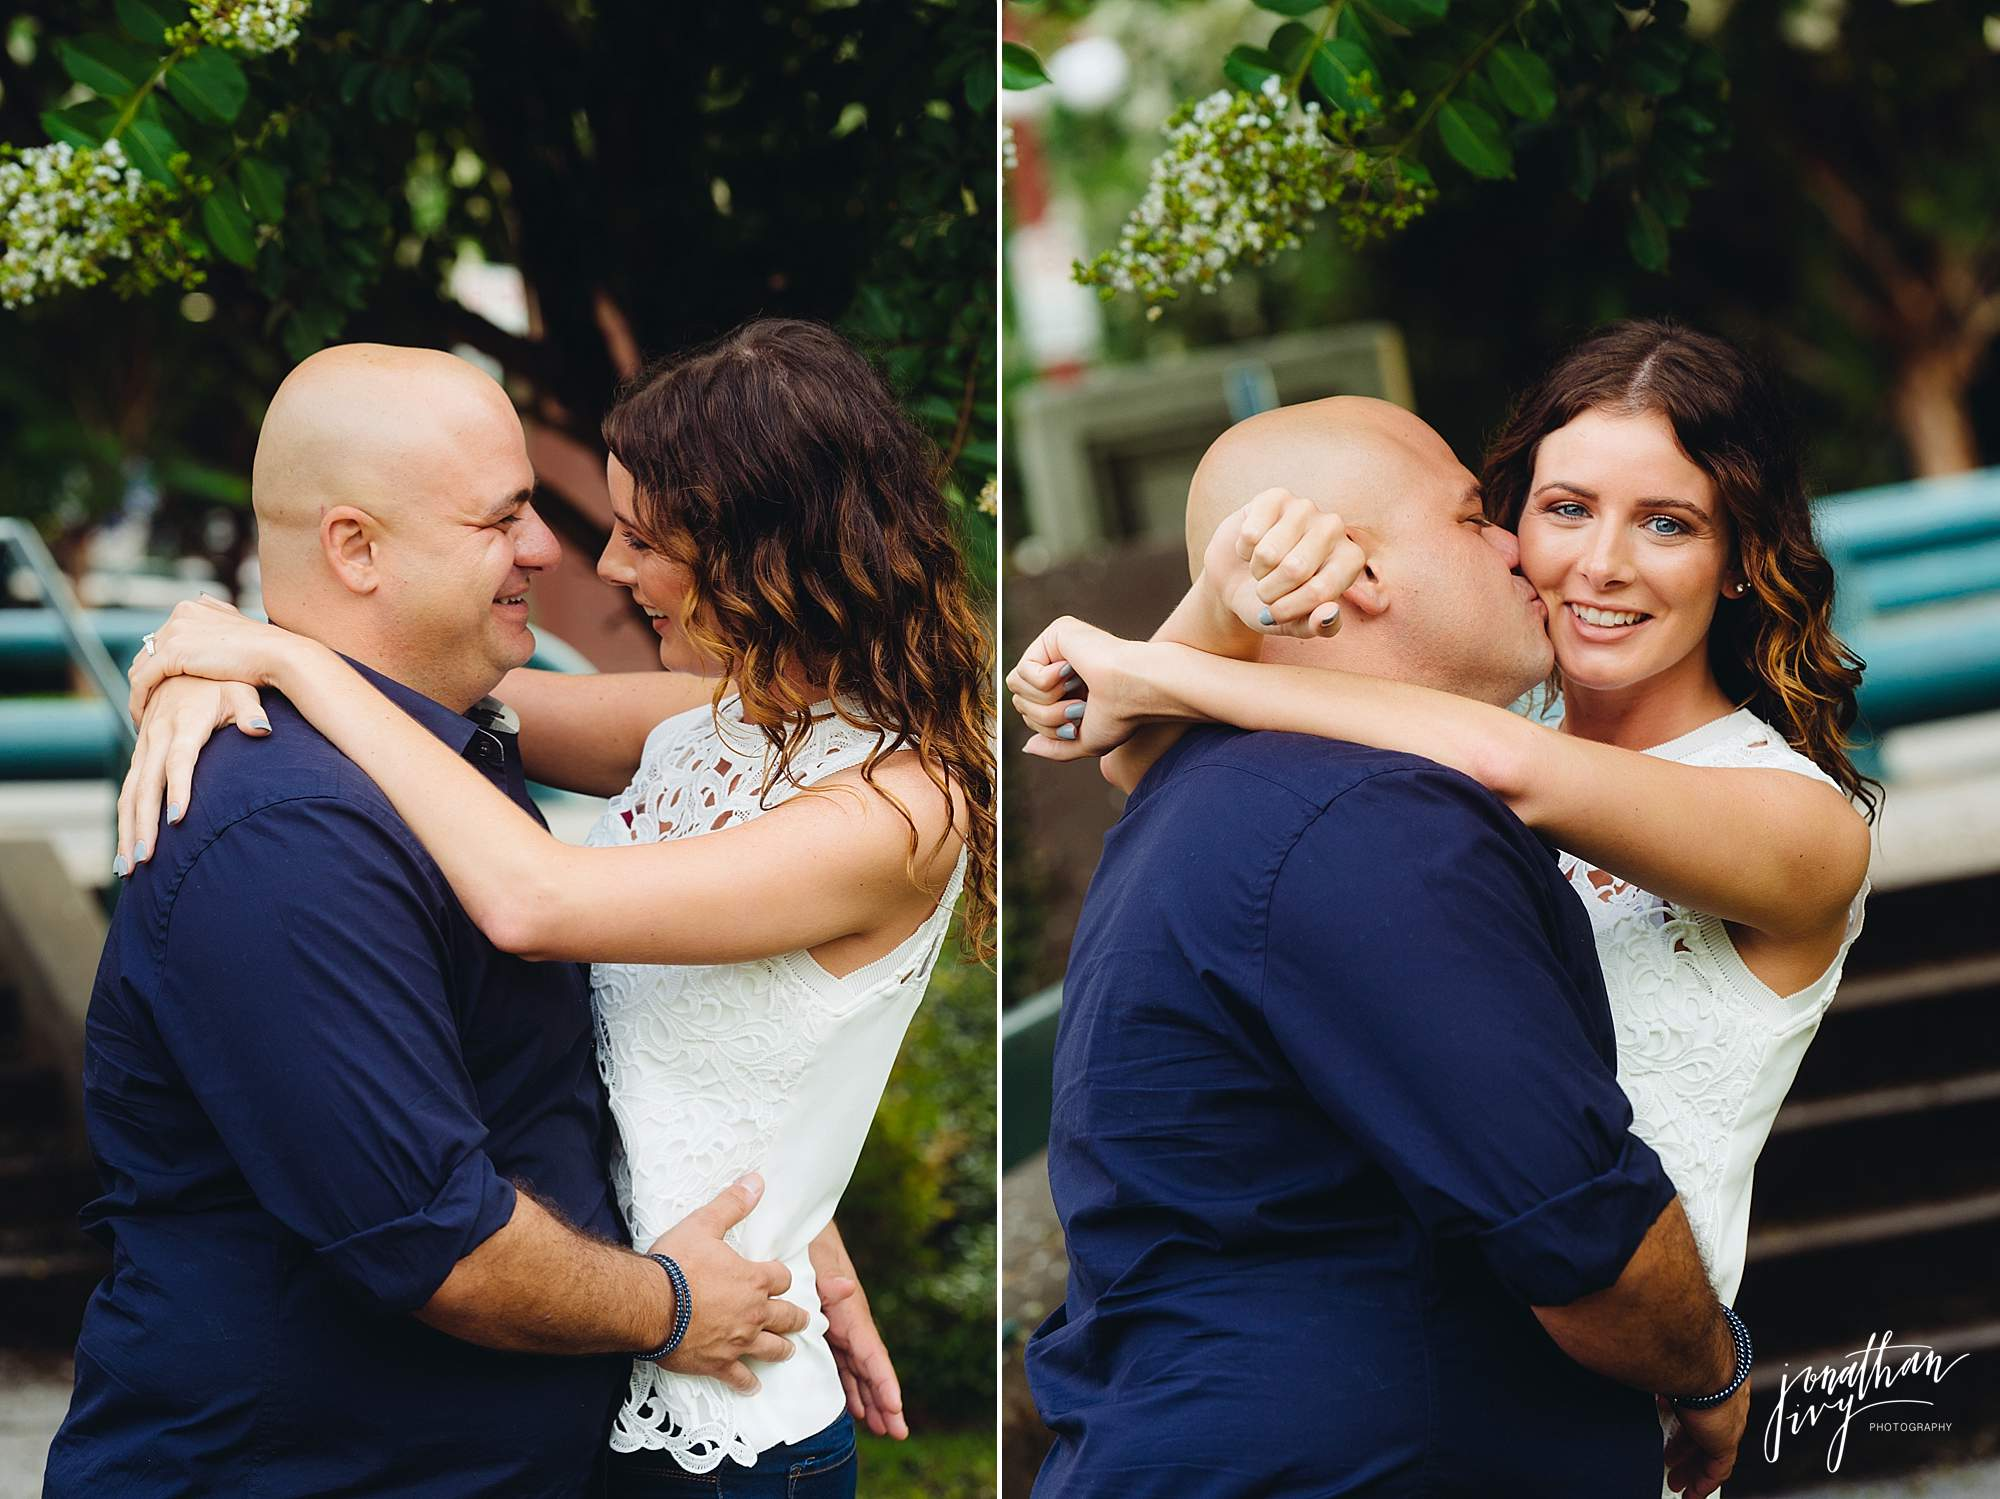 Romantic-Engagement-Photos-Houston_0010.jpg